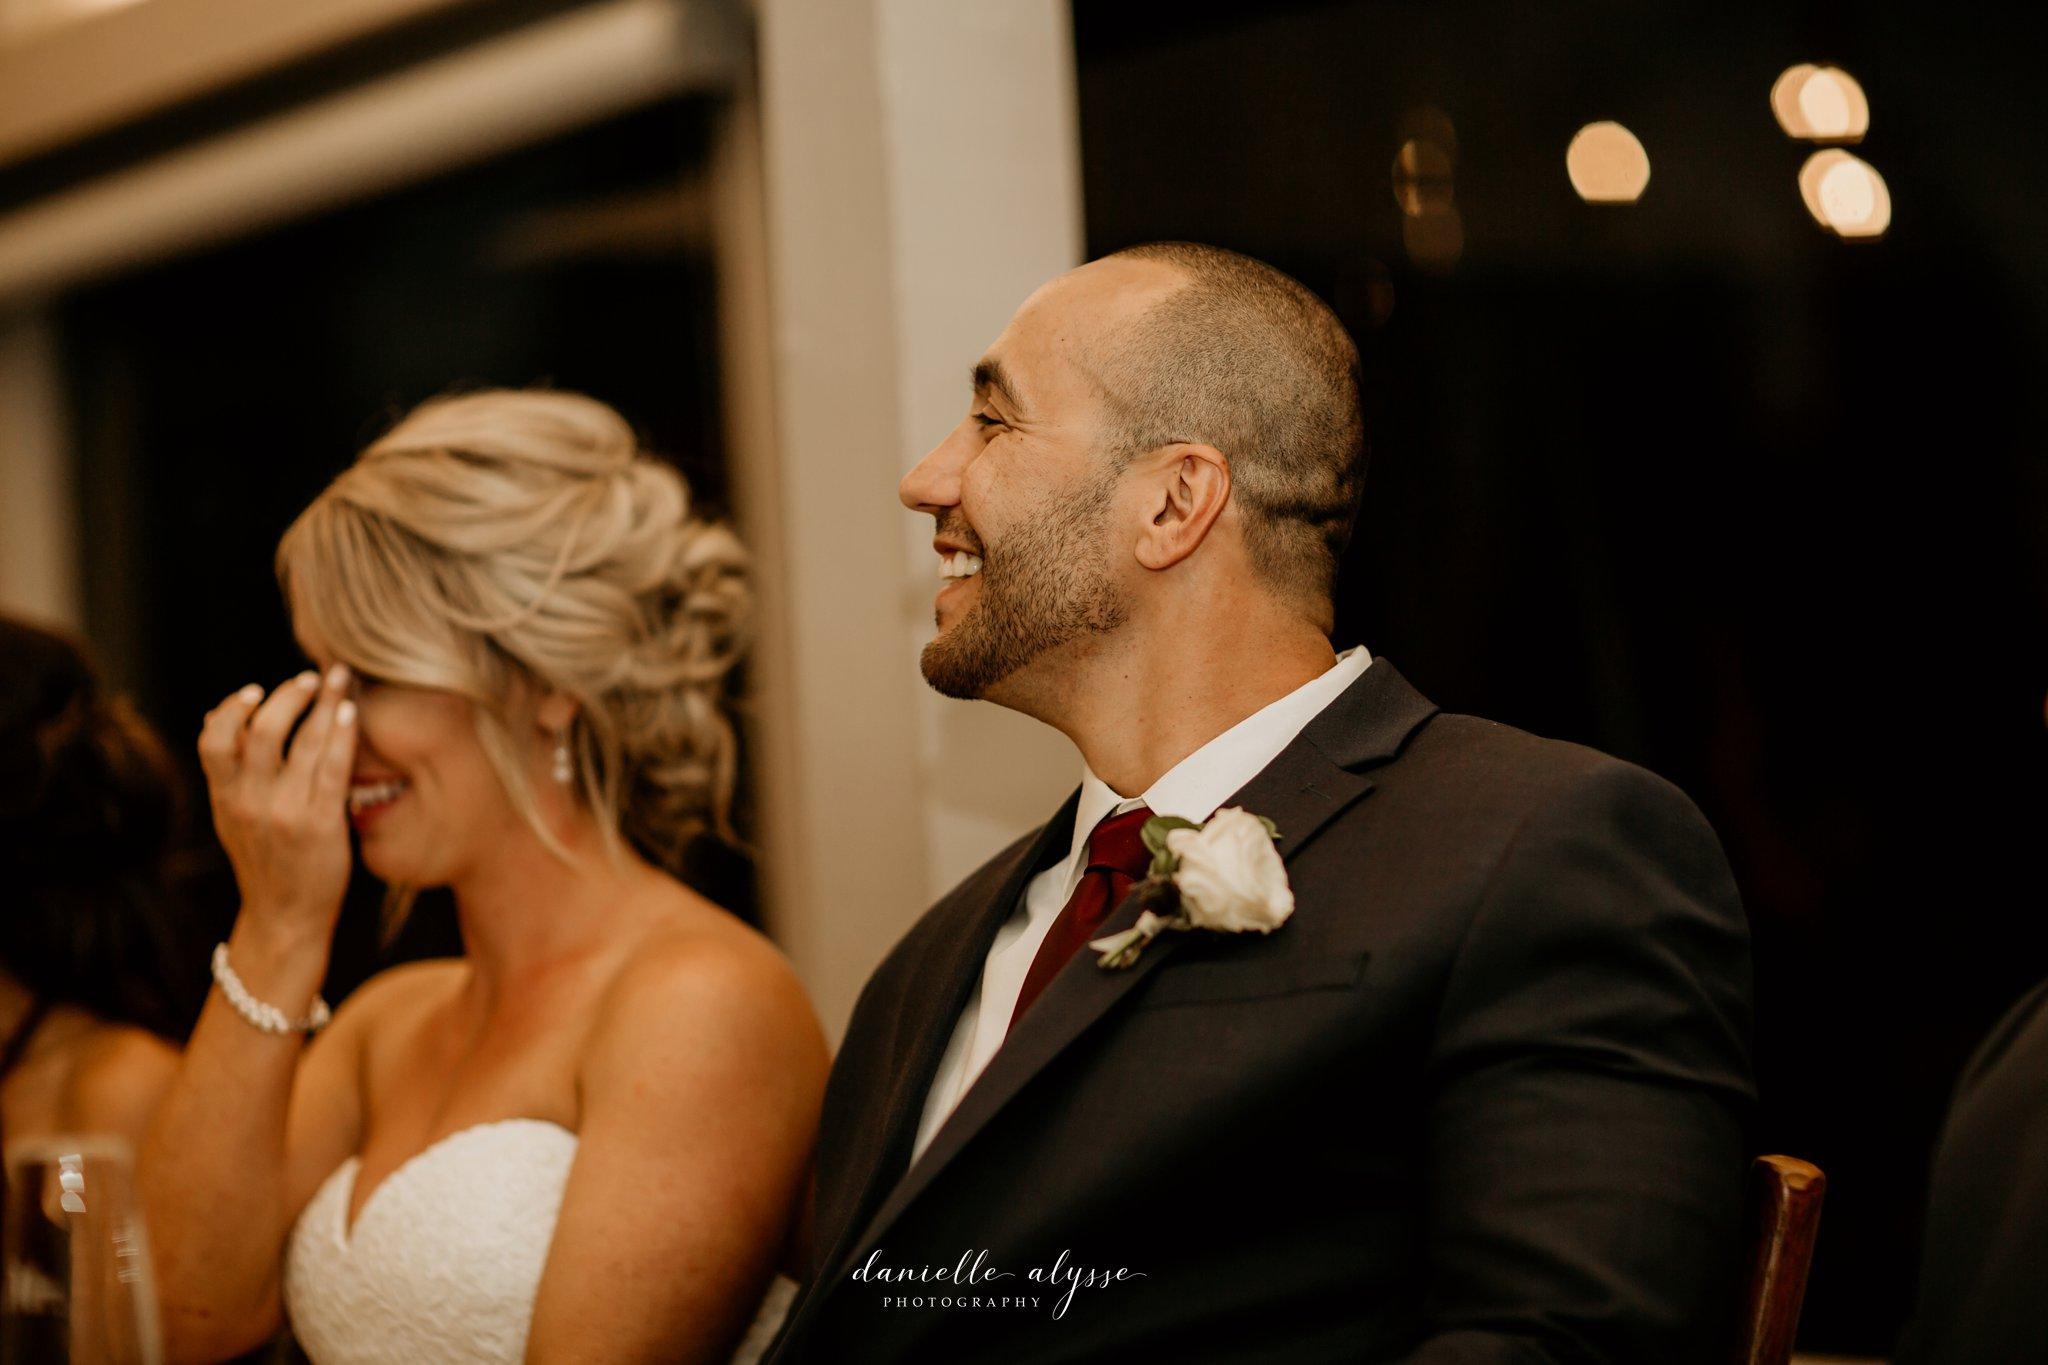 180831_wedding_stephanie_heavenly_south_lake_tahoe_danielle_alysse_photography_destination_blog_1150_WEB.jpg